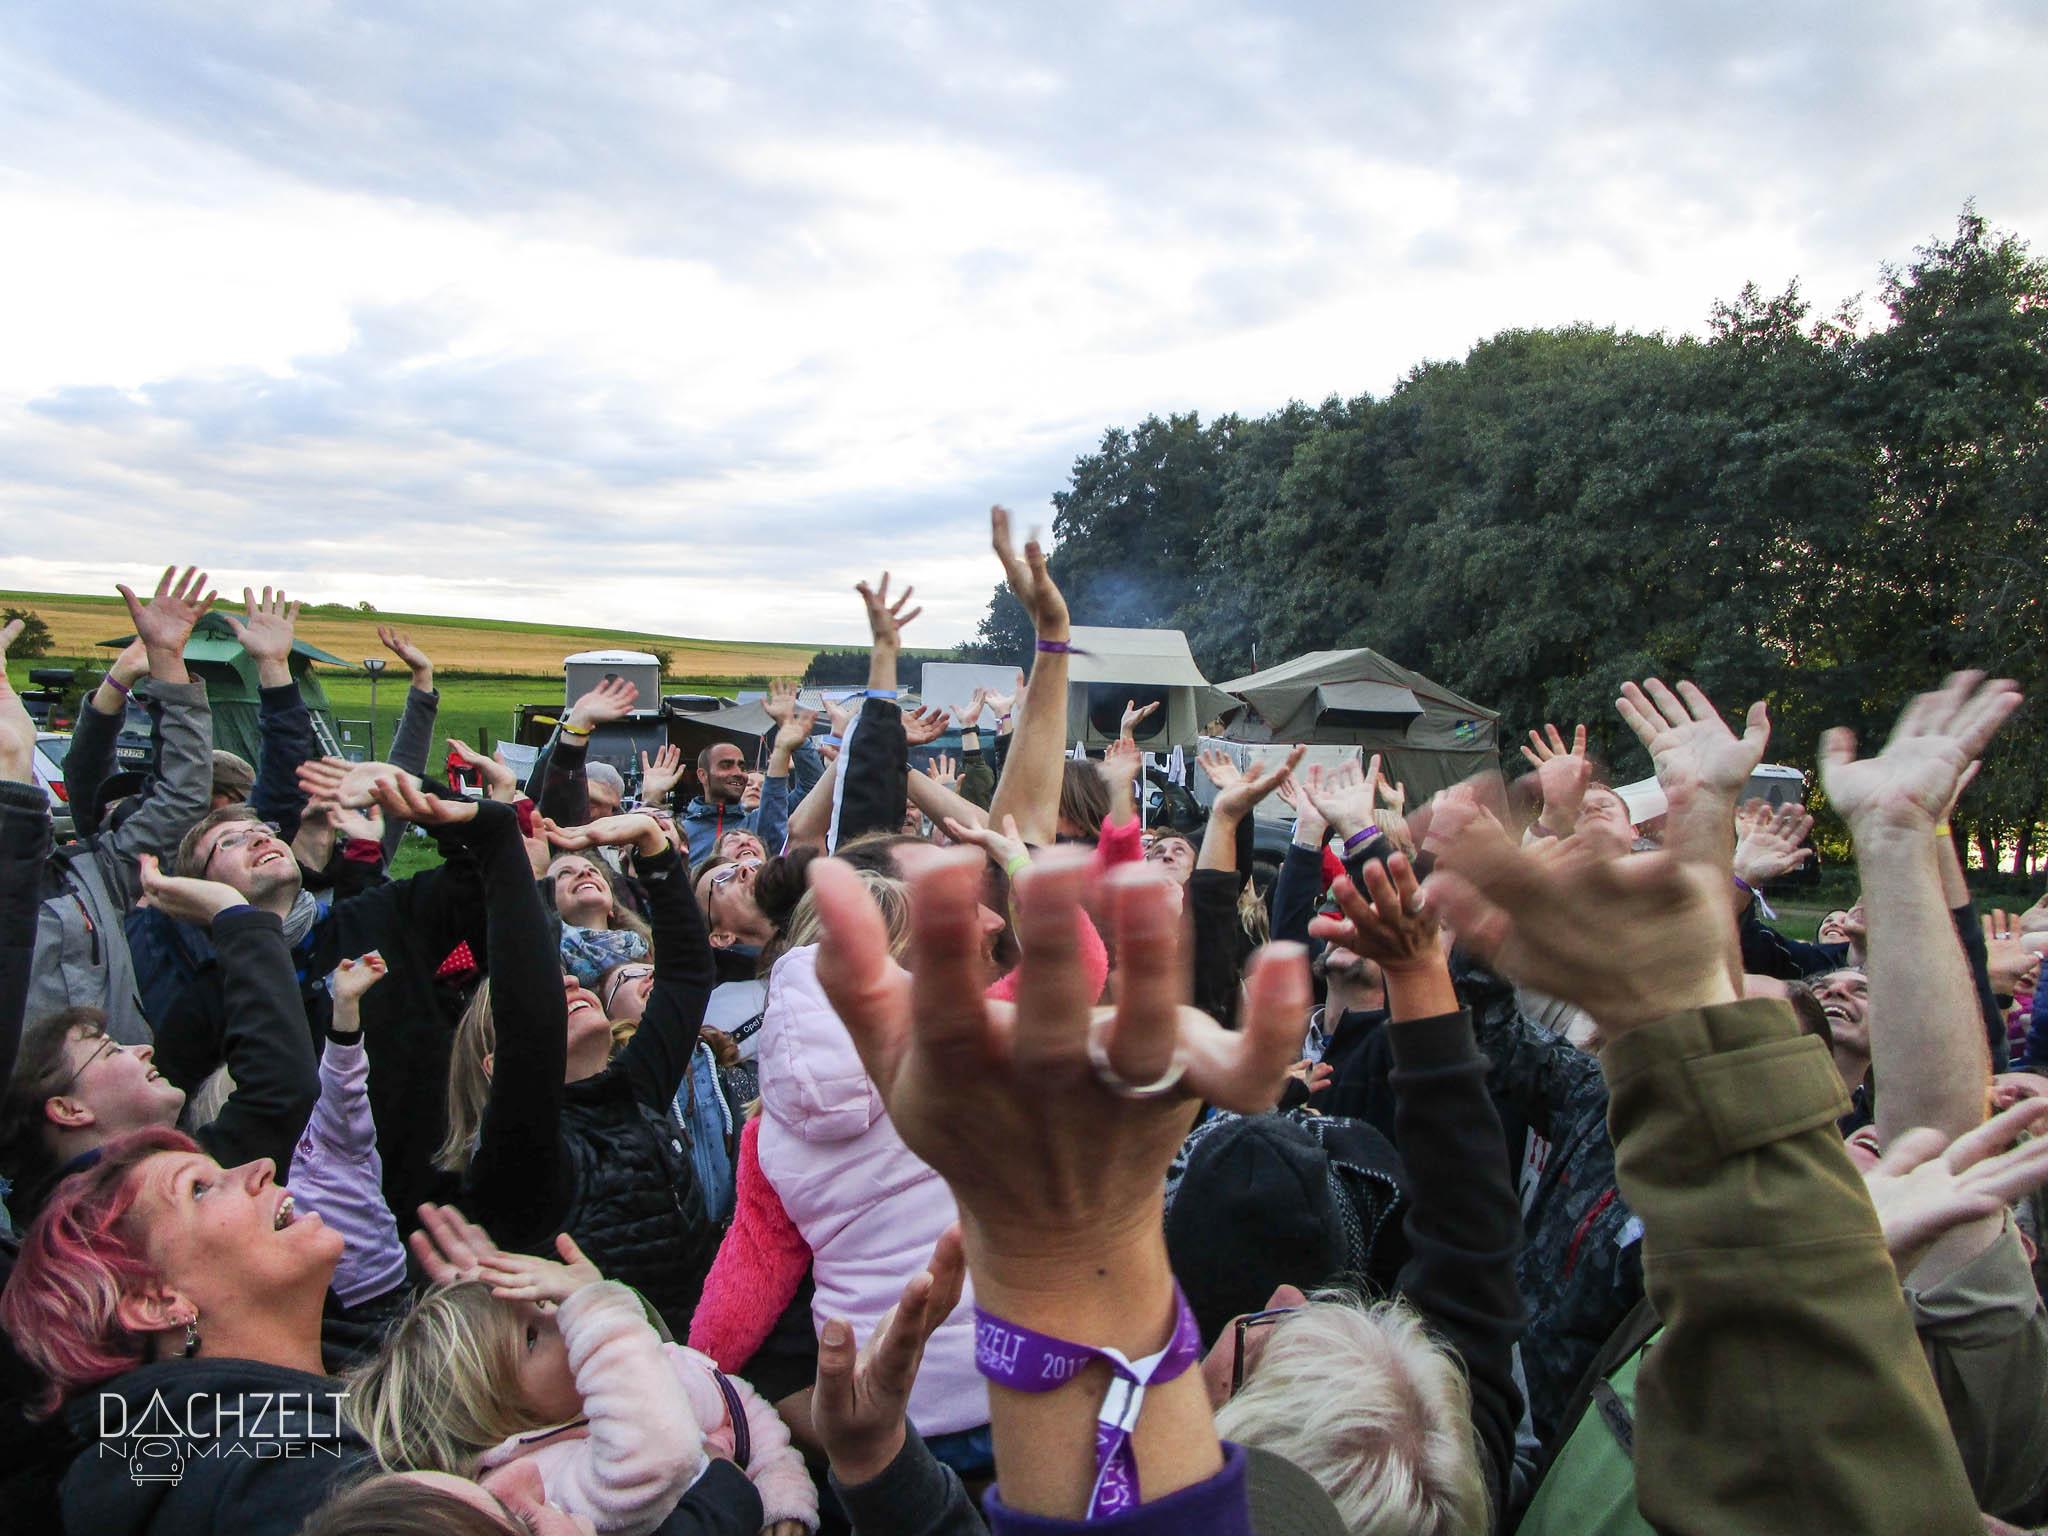 Dachzeltnomadentreffen 2017   180 Nomaden   Photo by Udo Vobl